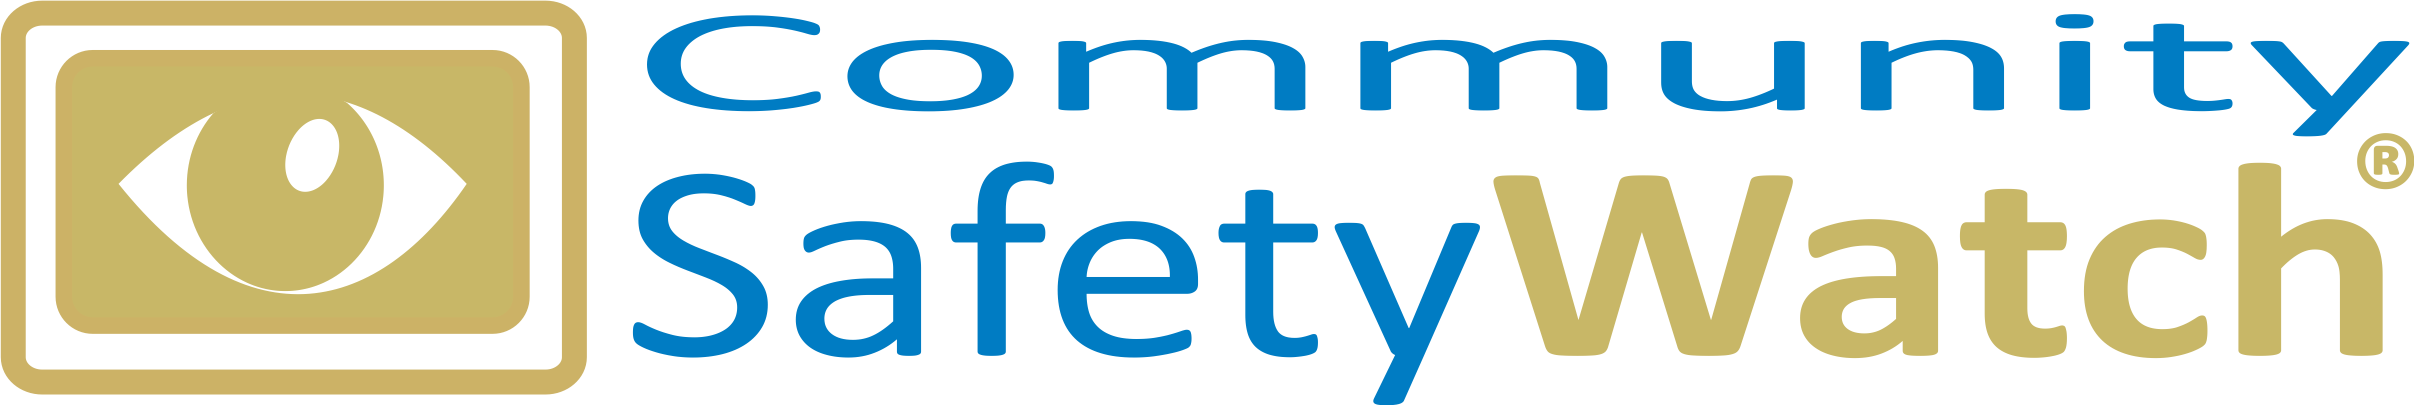 community-safety-watch